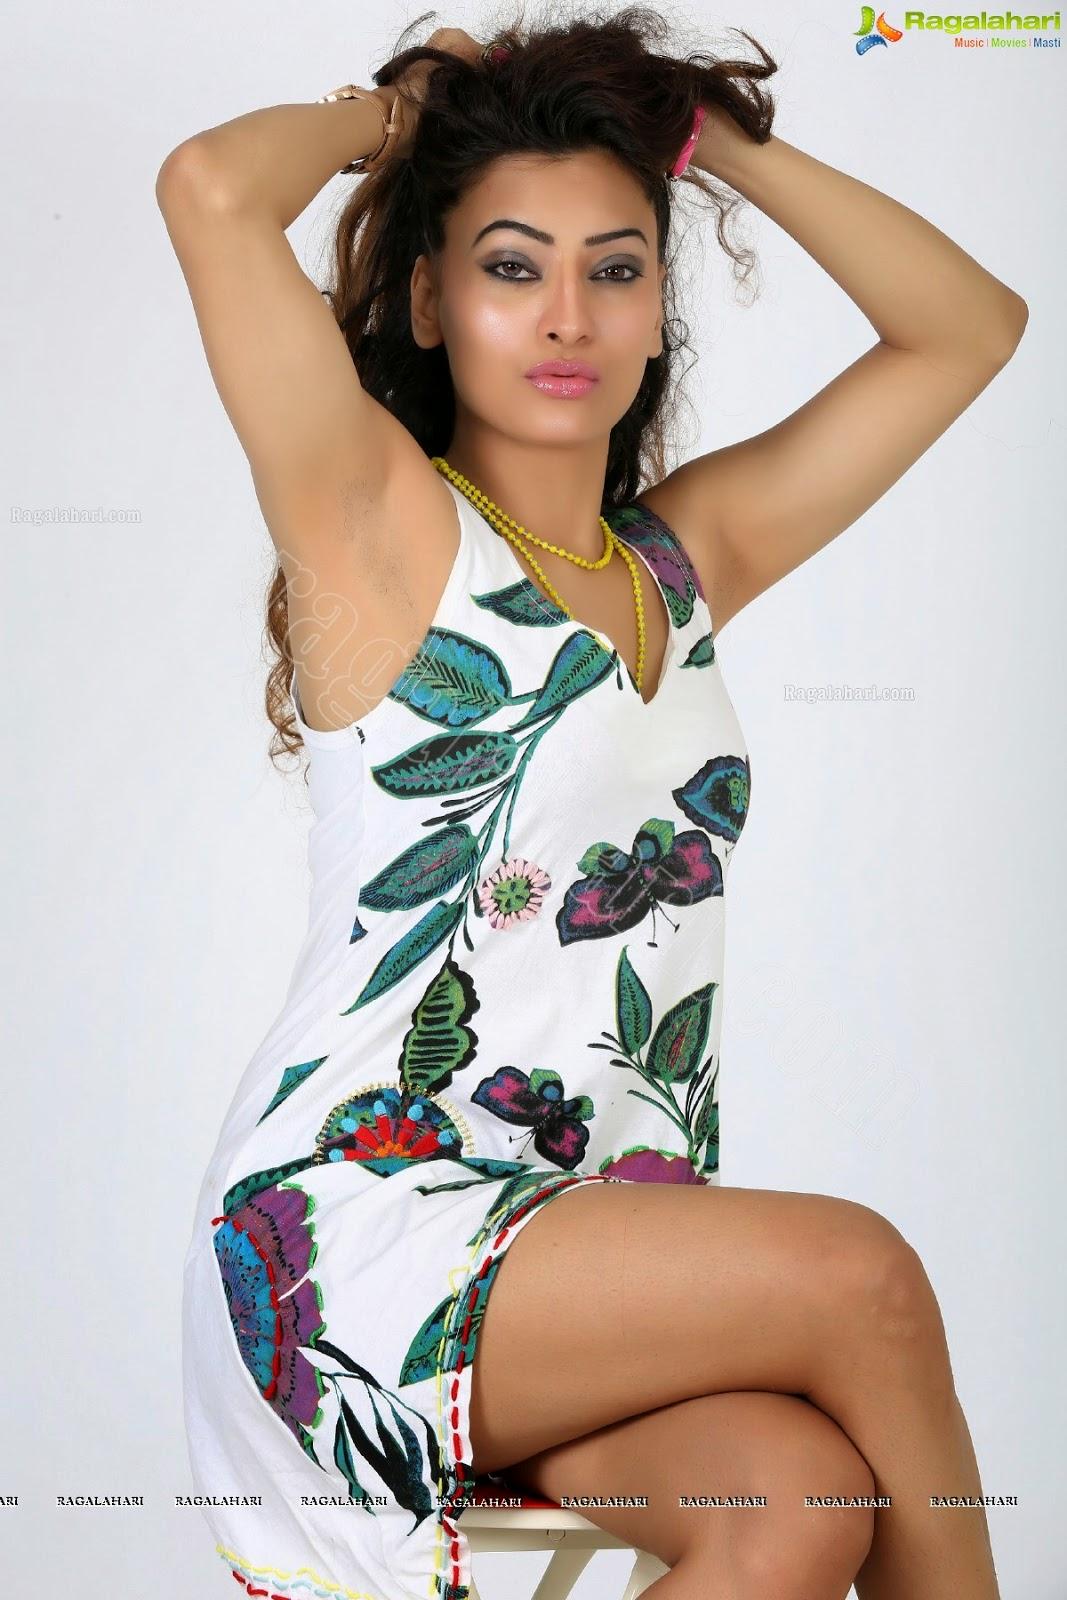 armpitz: Alanki Bakshi stubble LATEST (Her armpits exist for one and ...